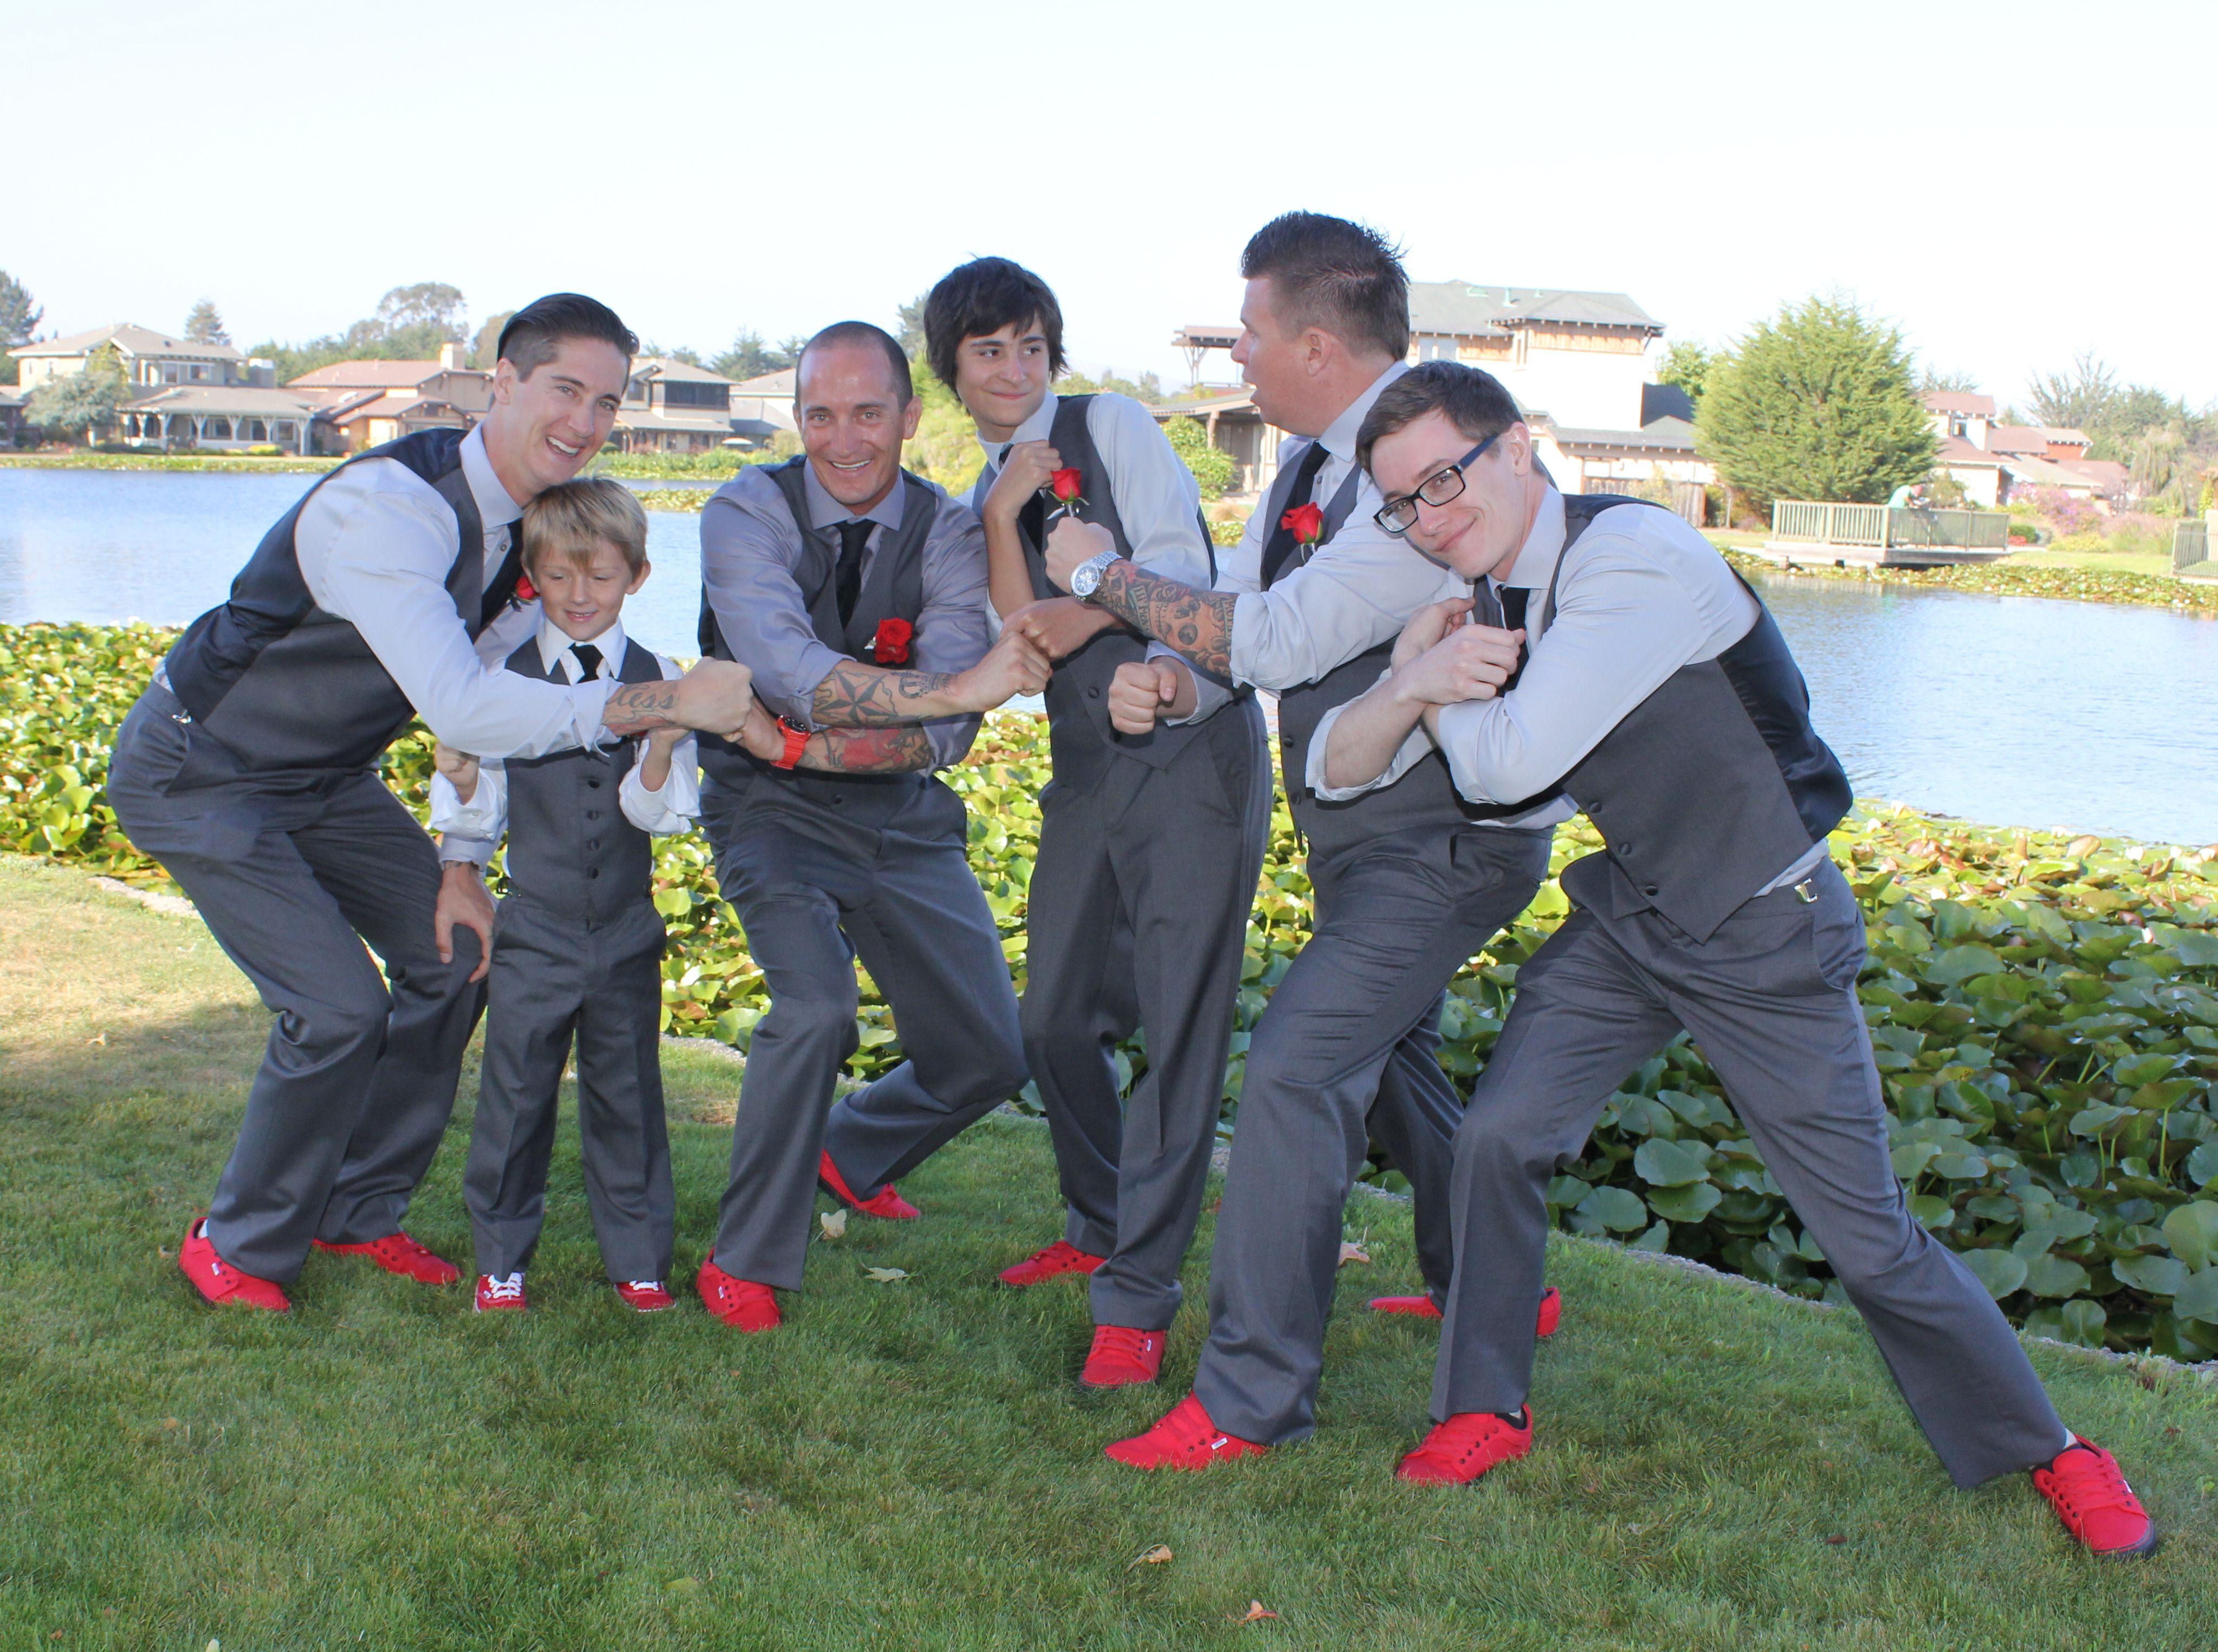 groom and grooms men